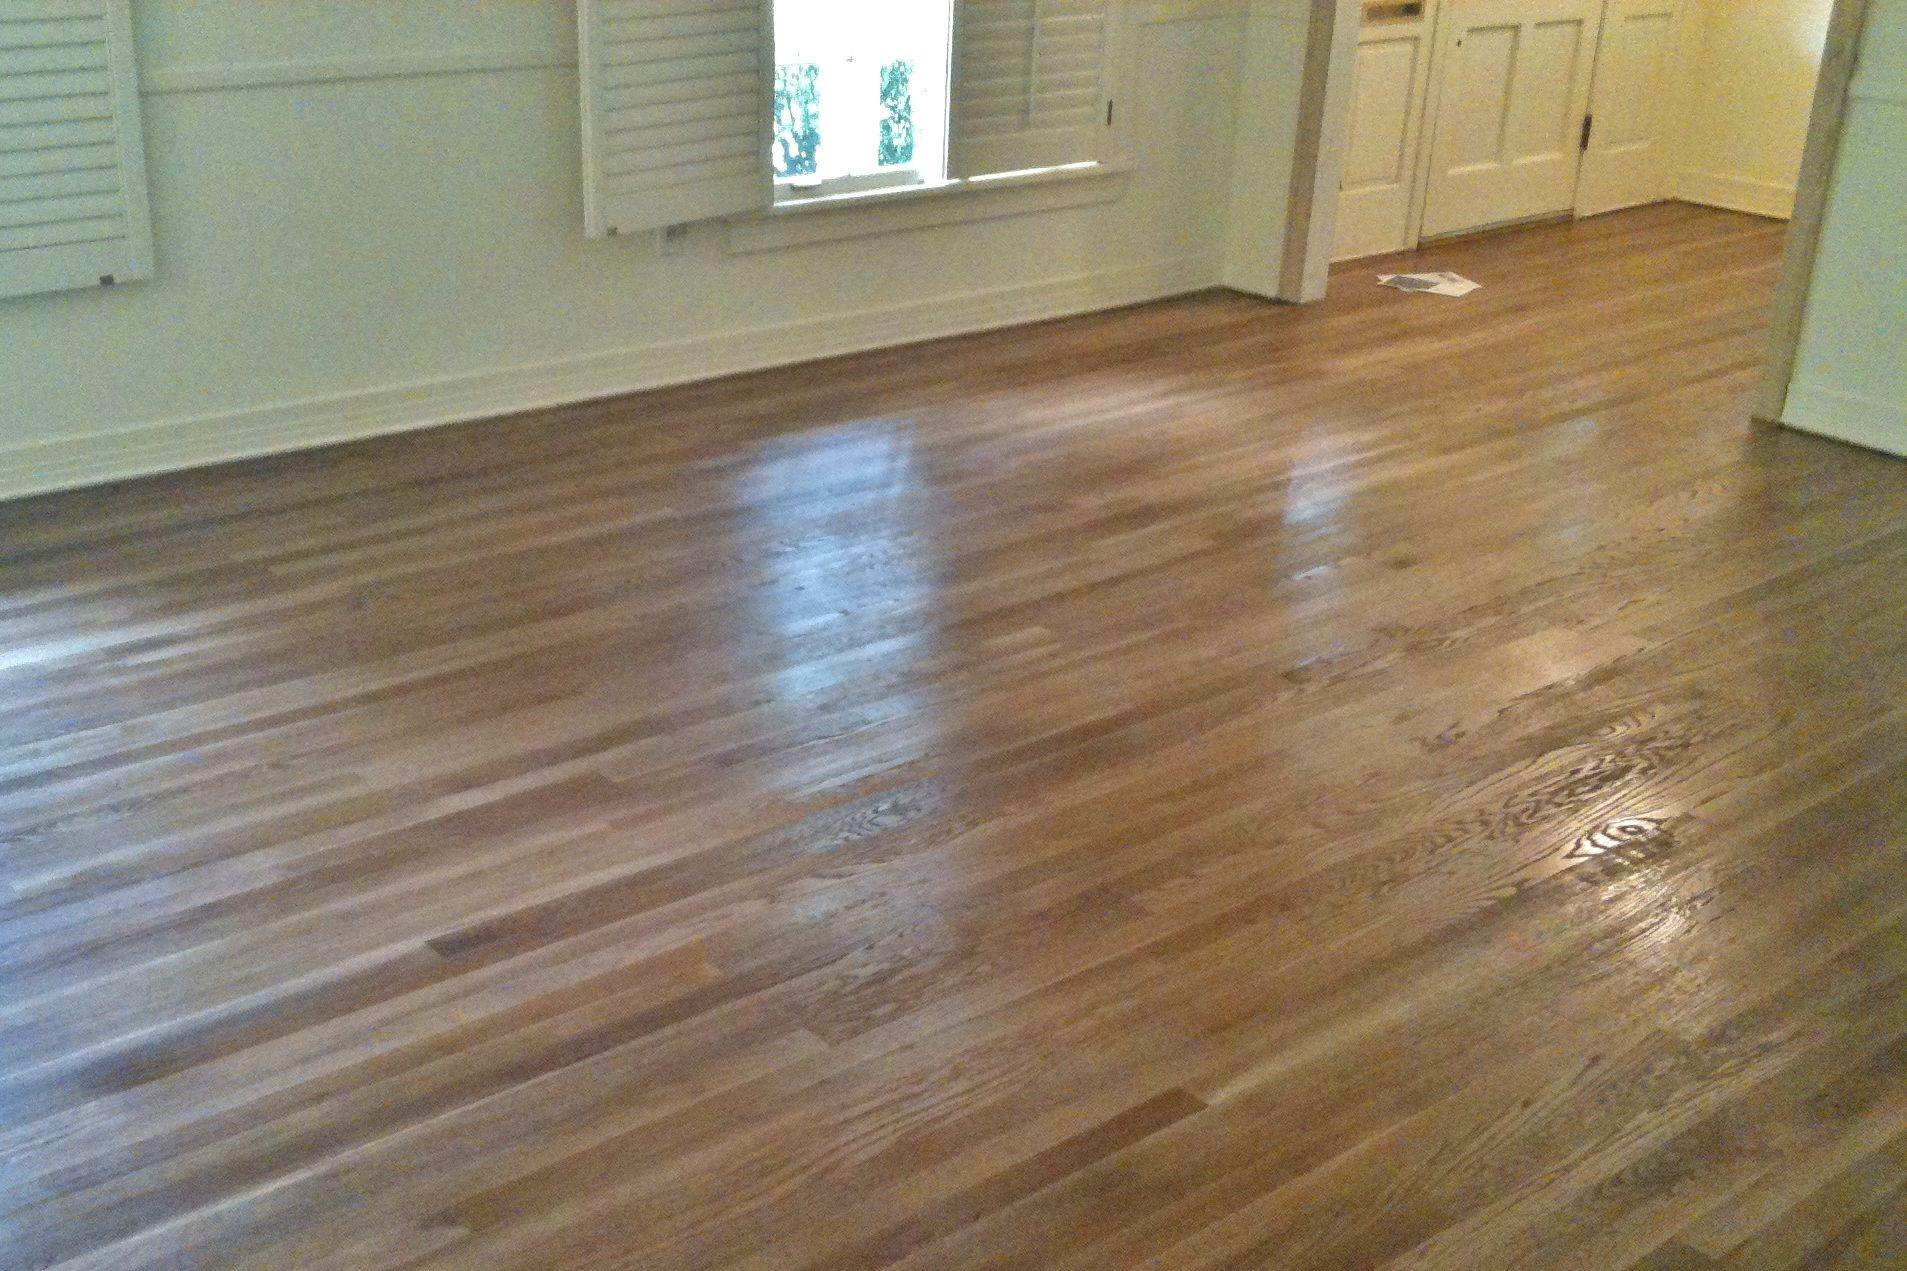 best hardwood floor stain colors of oak meet special walnut home design pinterest flooring pertaining to minwax special walnut stain on oak hardwood floors